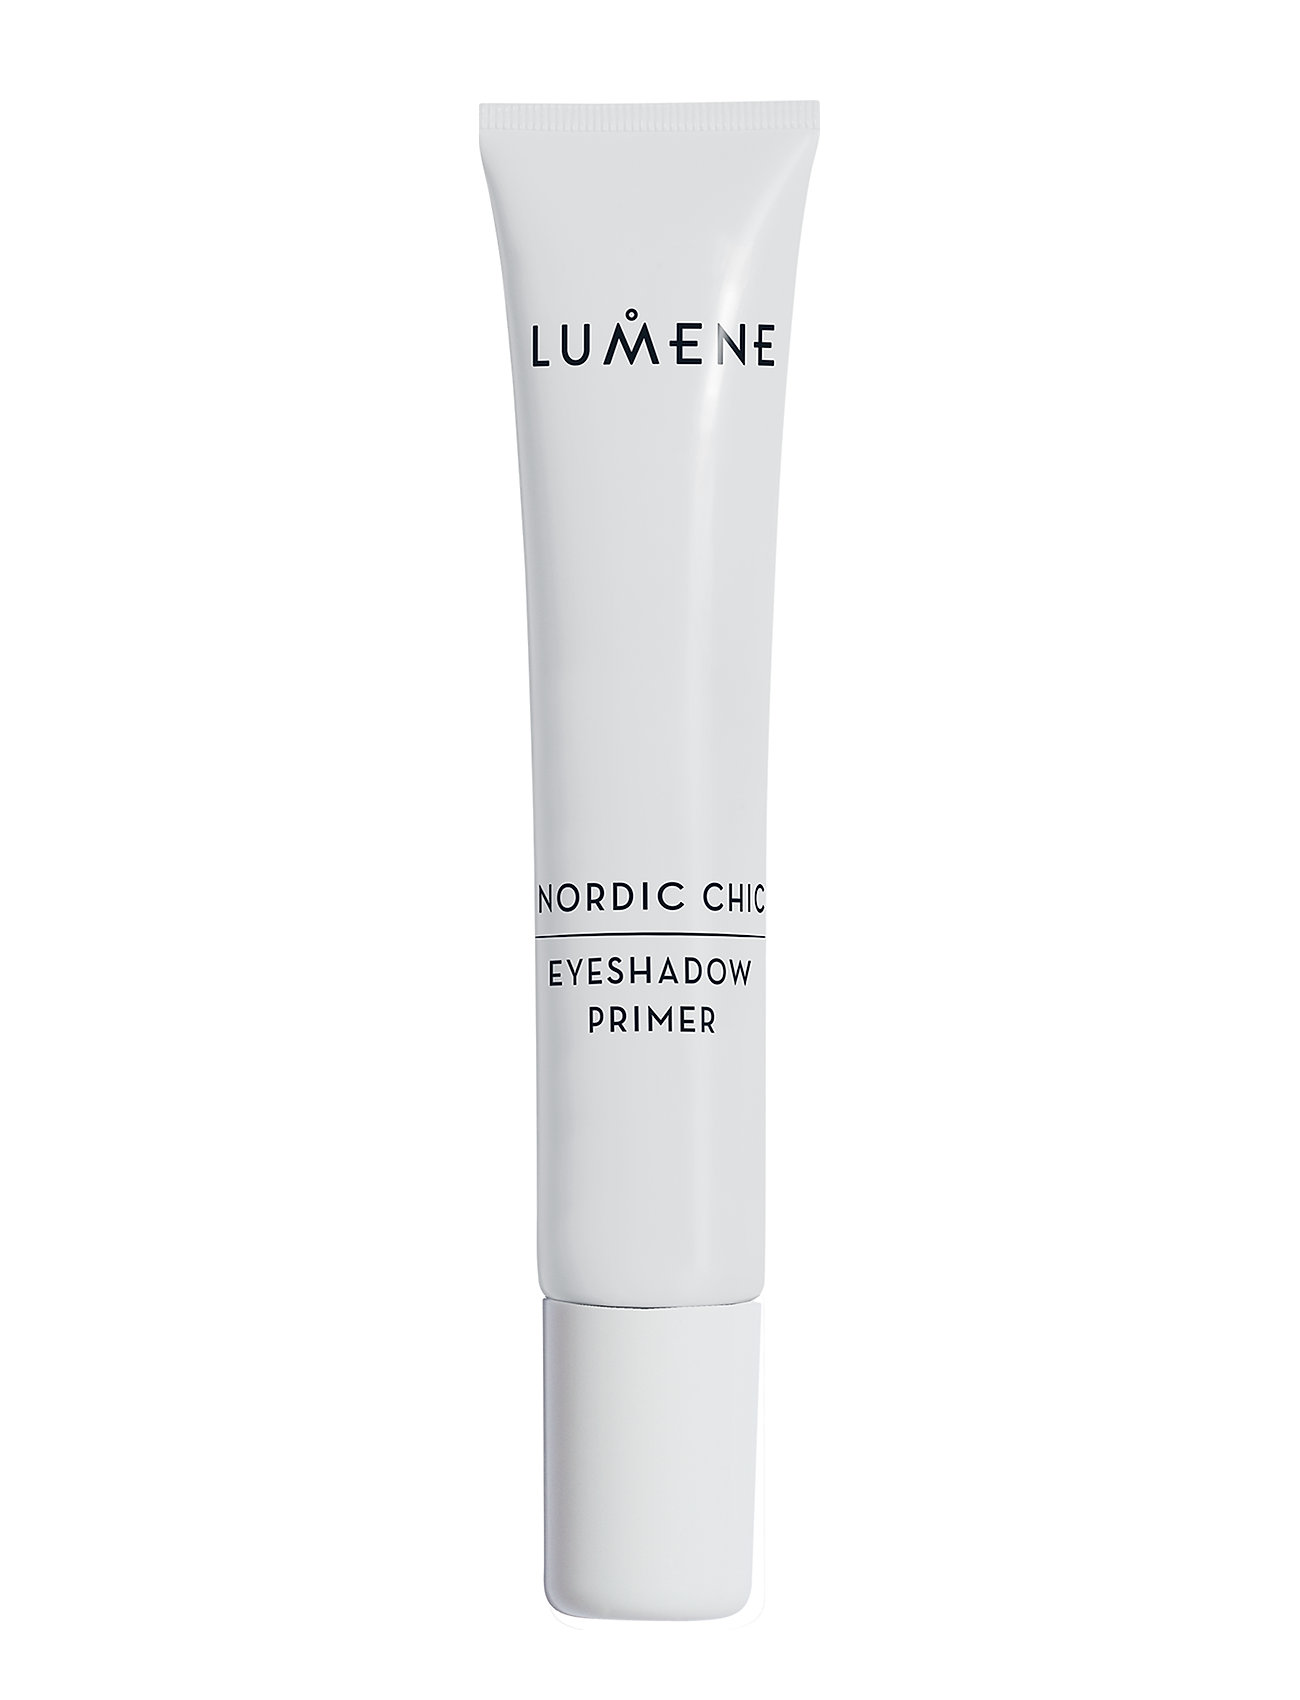 Image of Nordic Chic Eyeshadow Primer Øjenprimer Makeup Hvid LUMENE (3297685237)